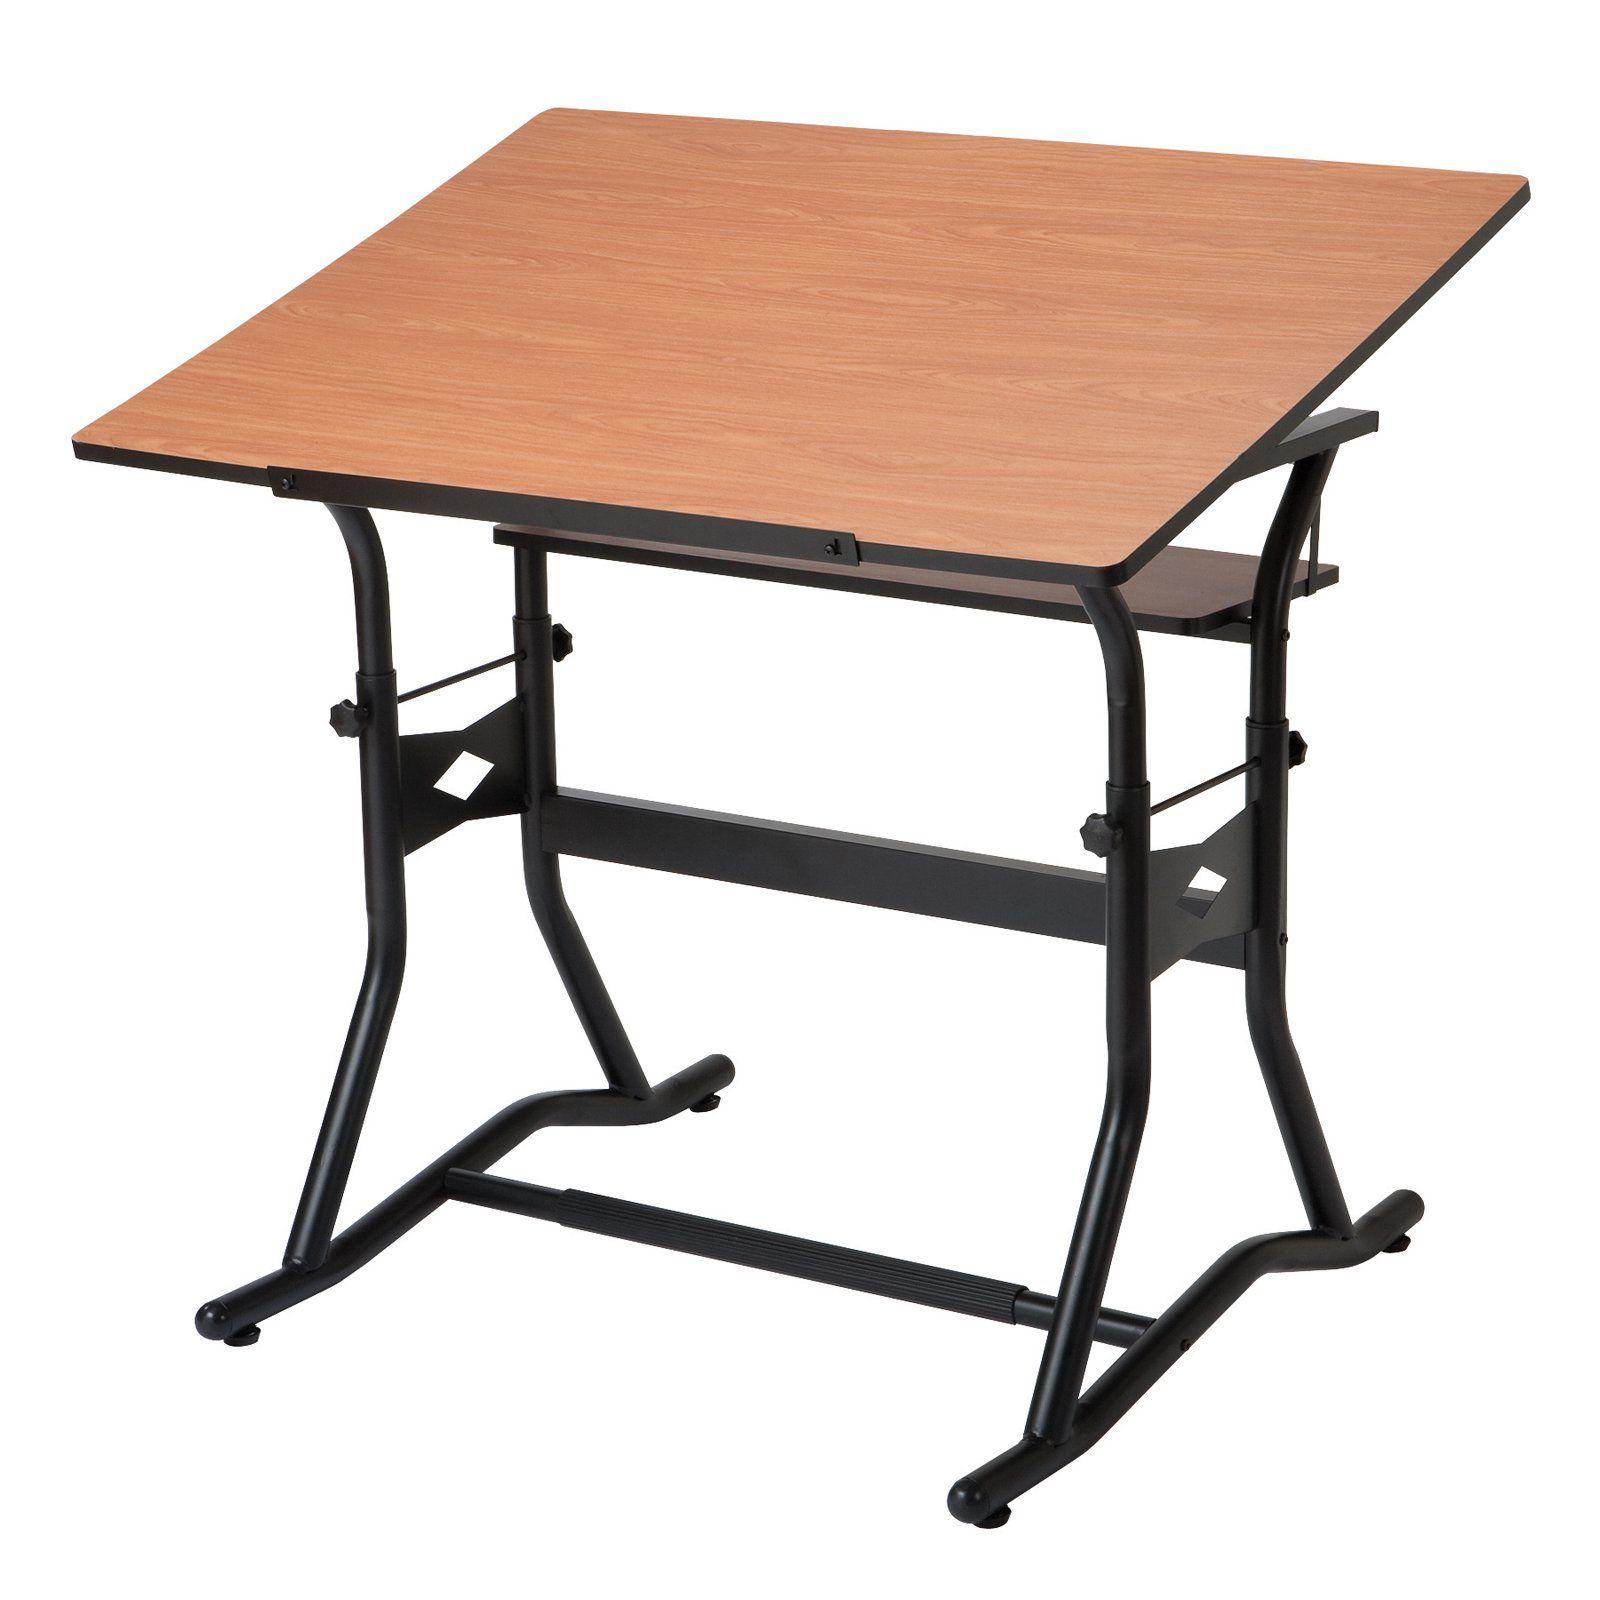 Alvin CraftMaster III Adjustable Drafting Table | From Hayneedle.com